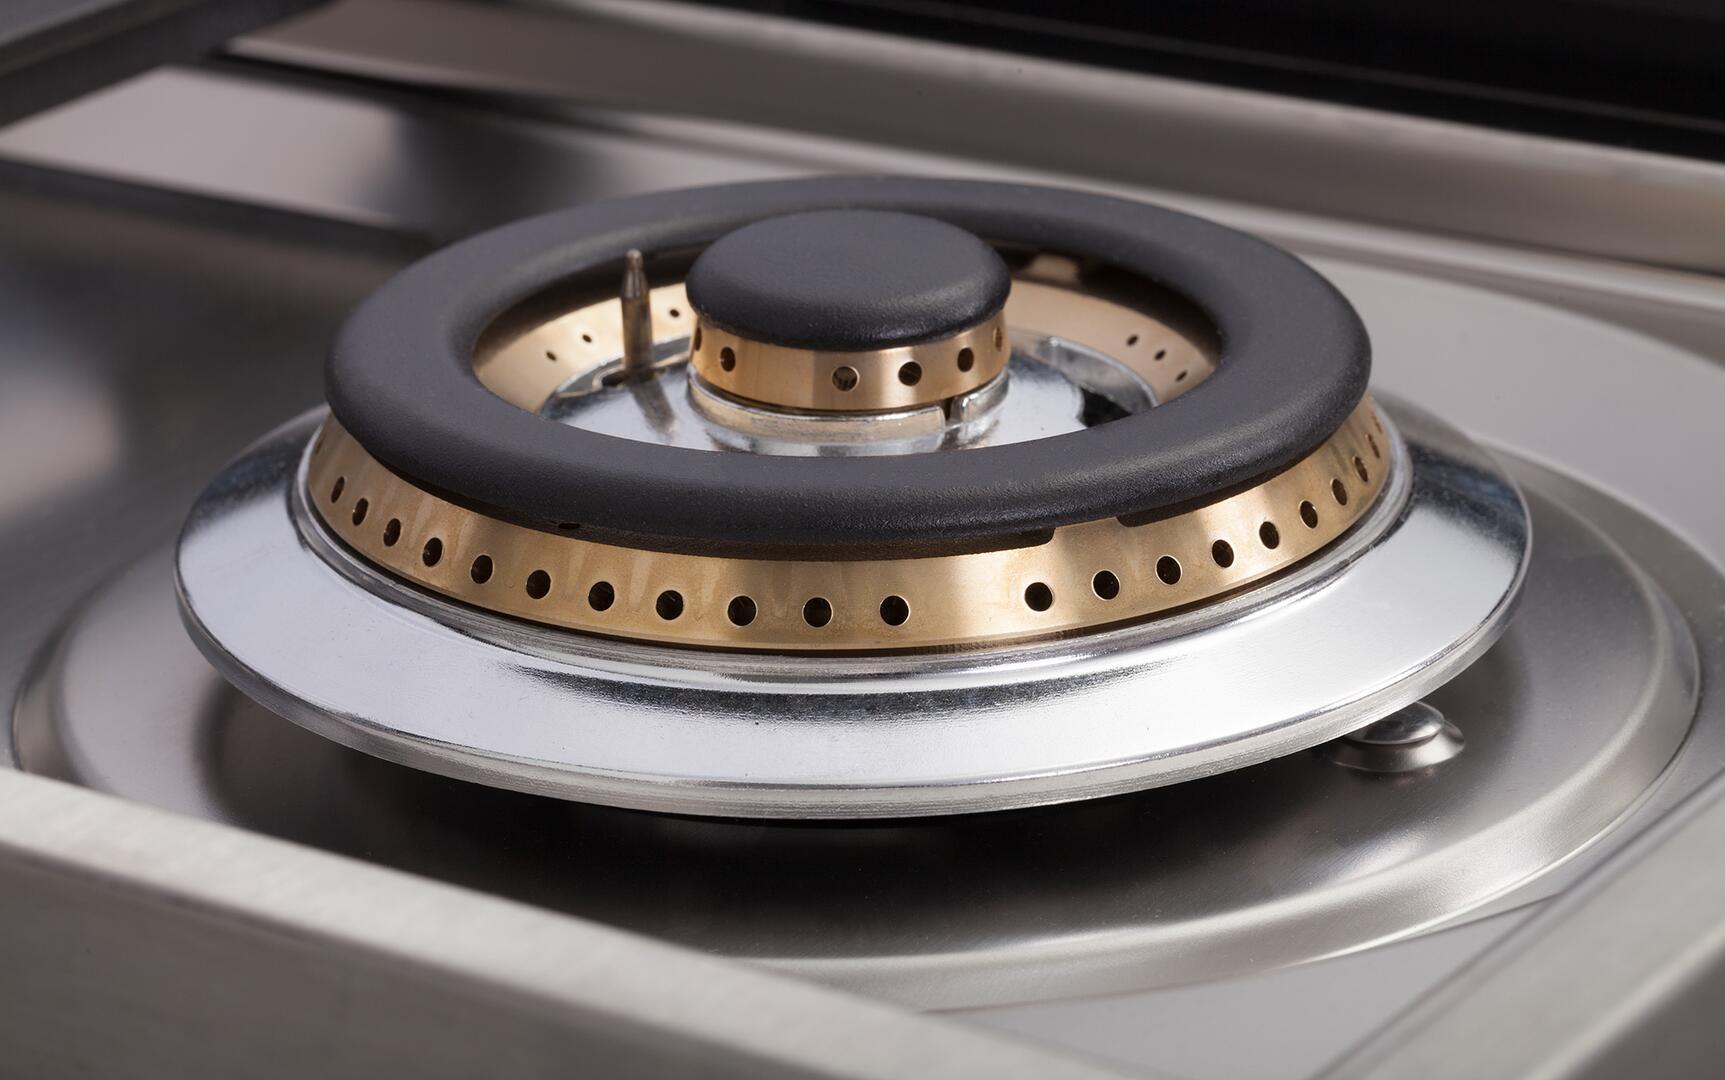 Ilve Nostalgie UPDN100FDMPVSLP Freestanding Dual Fuel Range Green, 23